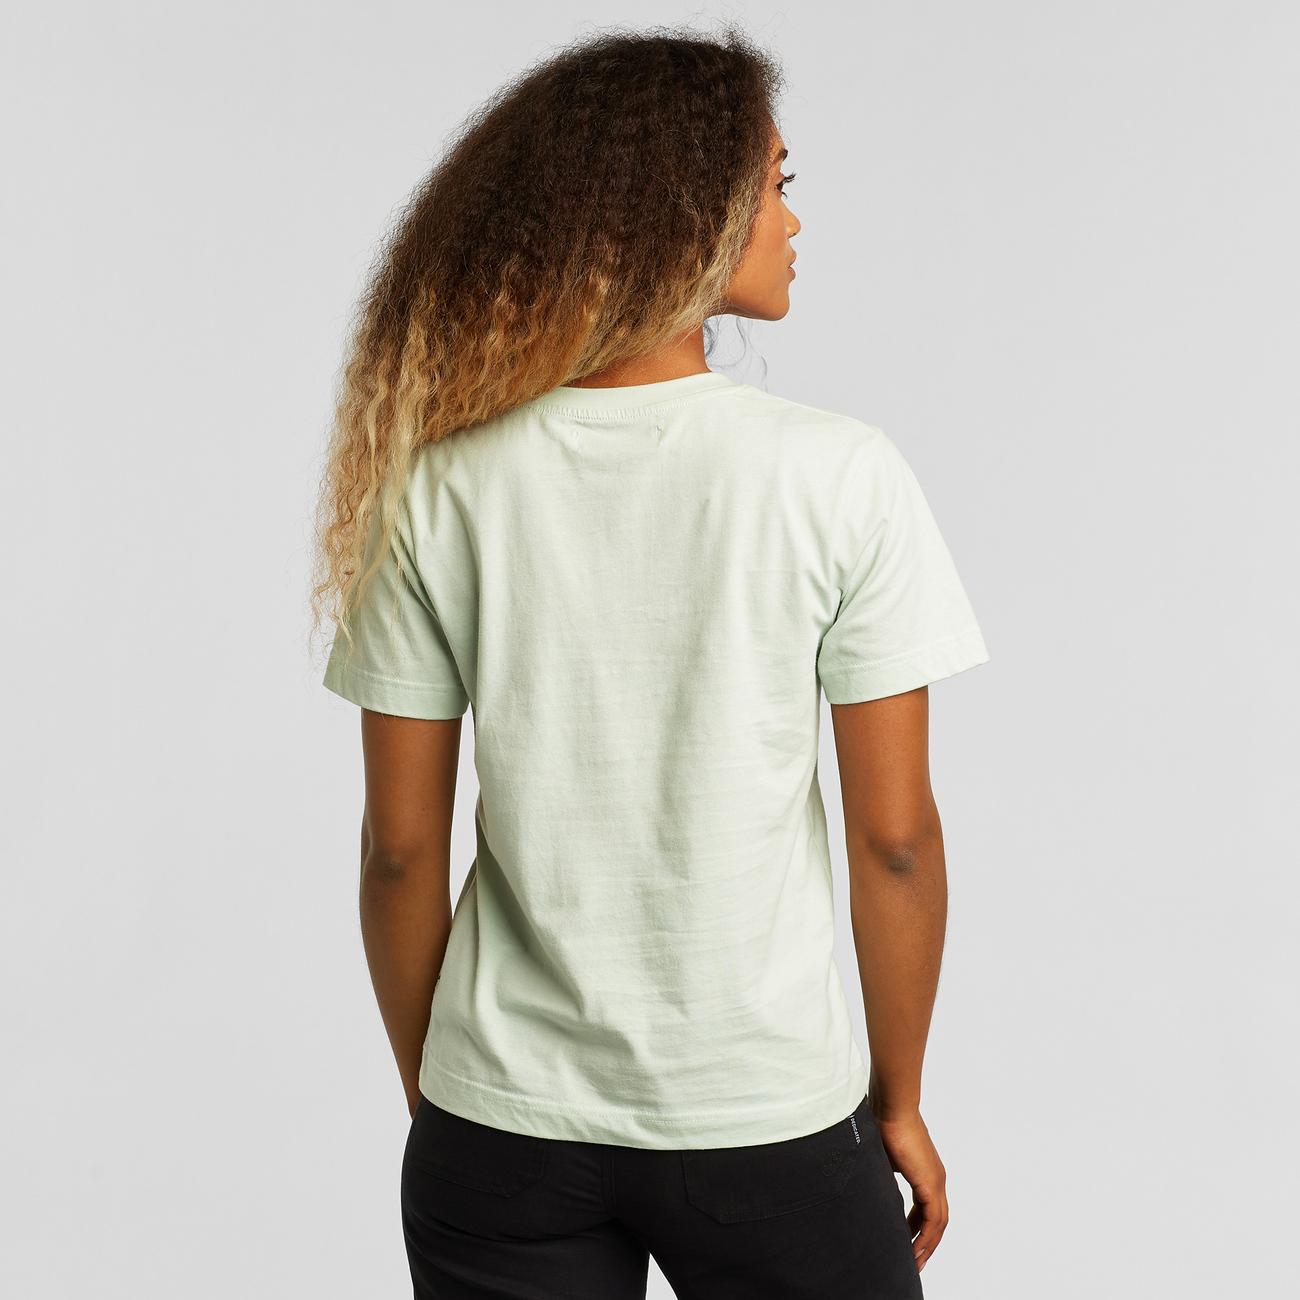 T-shirt Mysen Better Together Mint